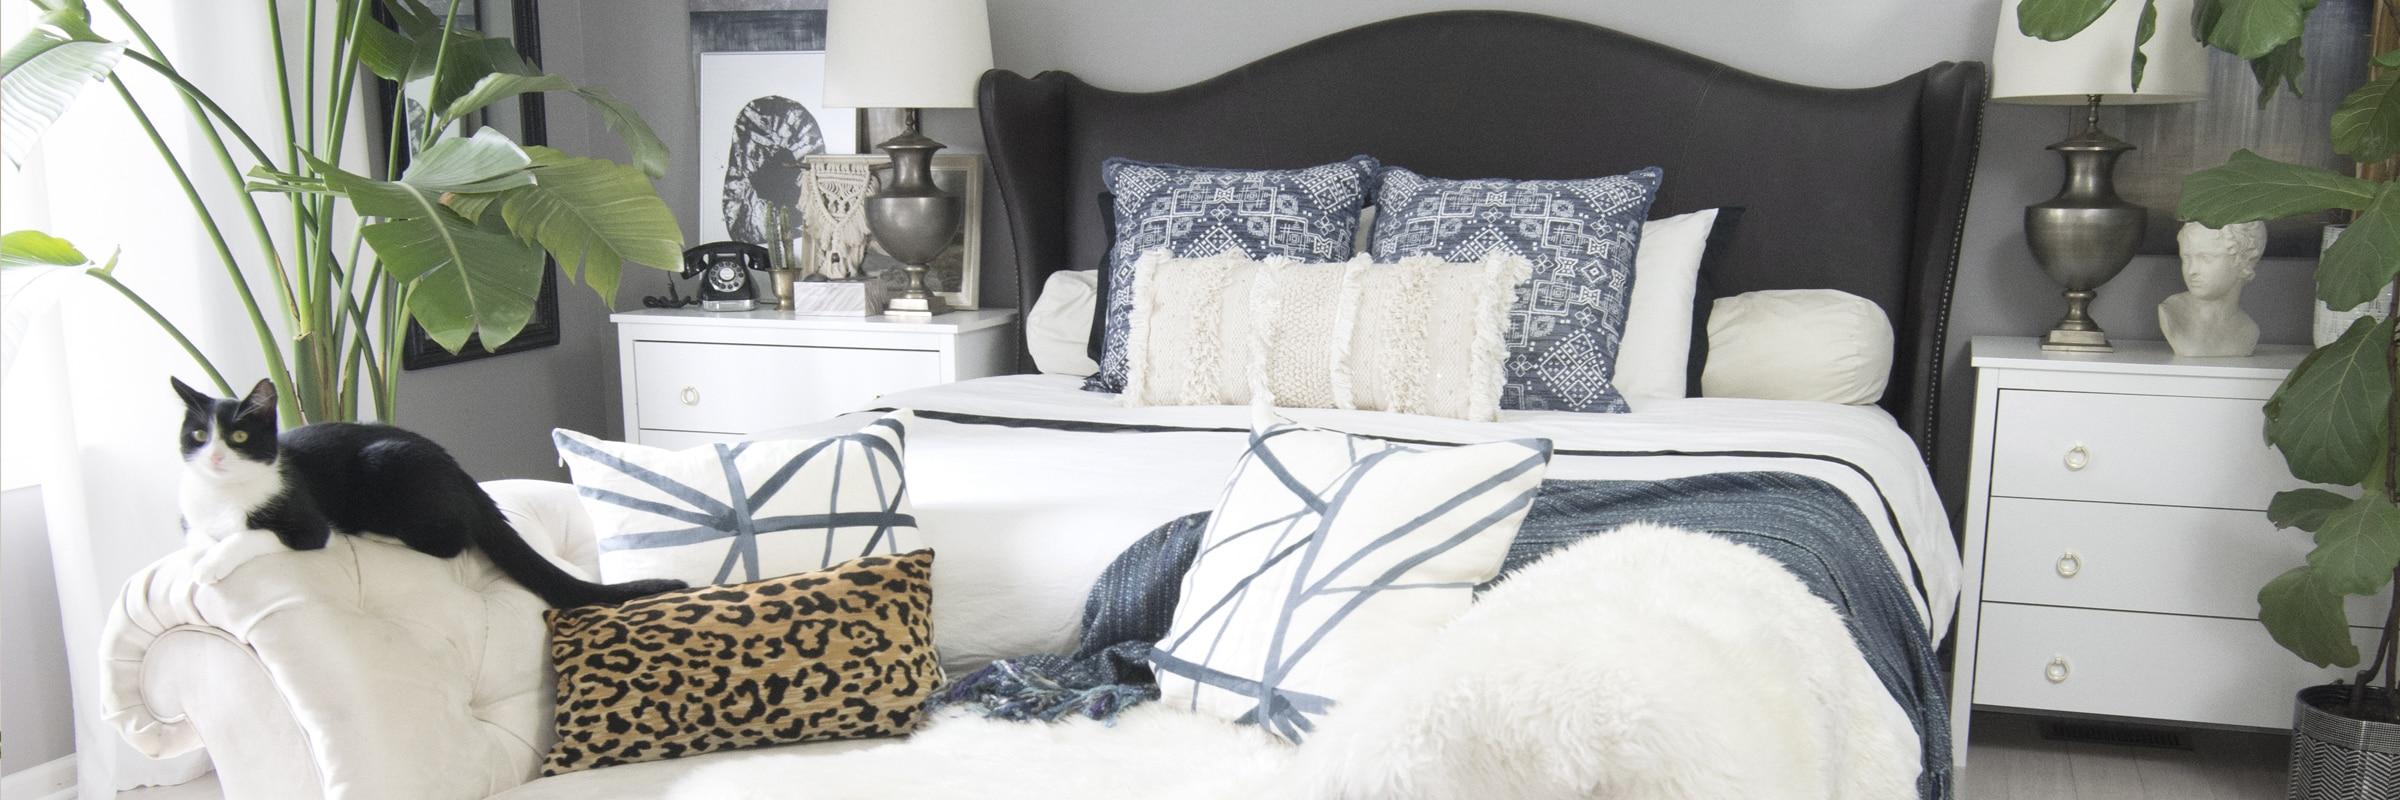 homeslider-bedroom